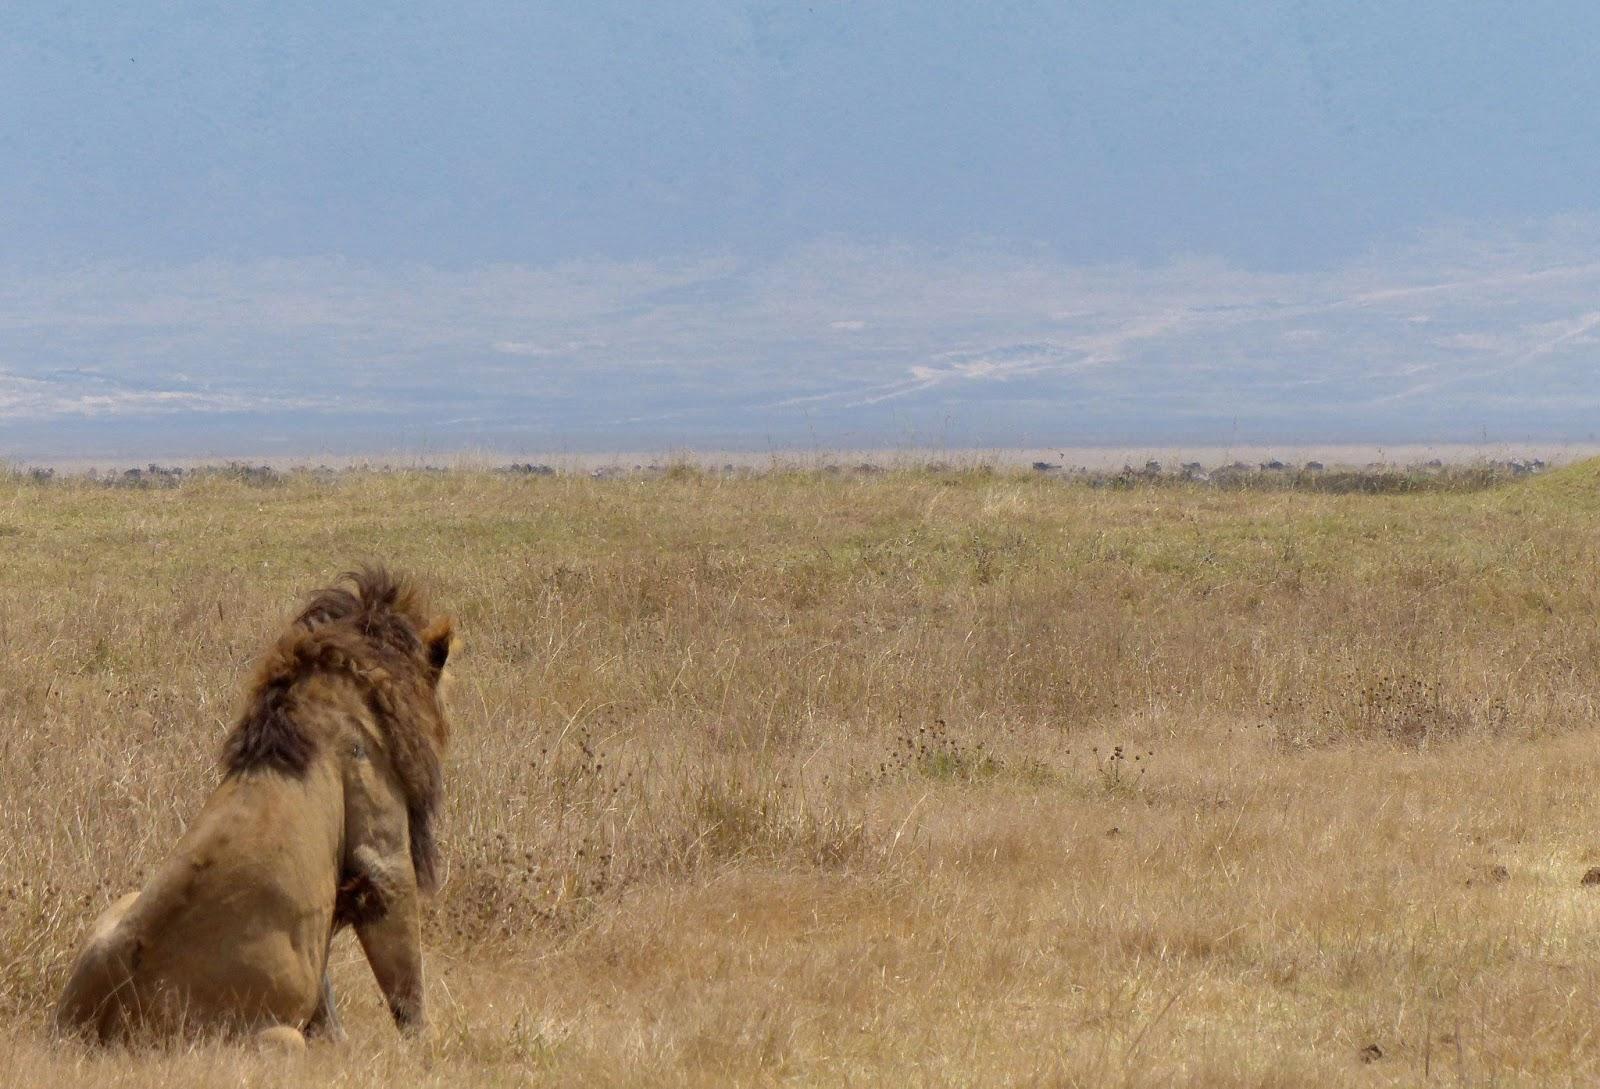 http://4.bp.blogspot.com/-rr0Glc_MpHA/UirzqgTqlhI/AAAAAAAACUg/Q5y317ZMjLc/s1600/lion+back+2.jpg